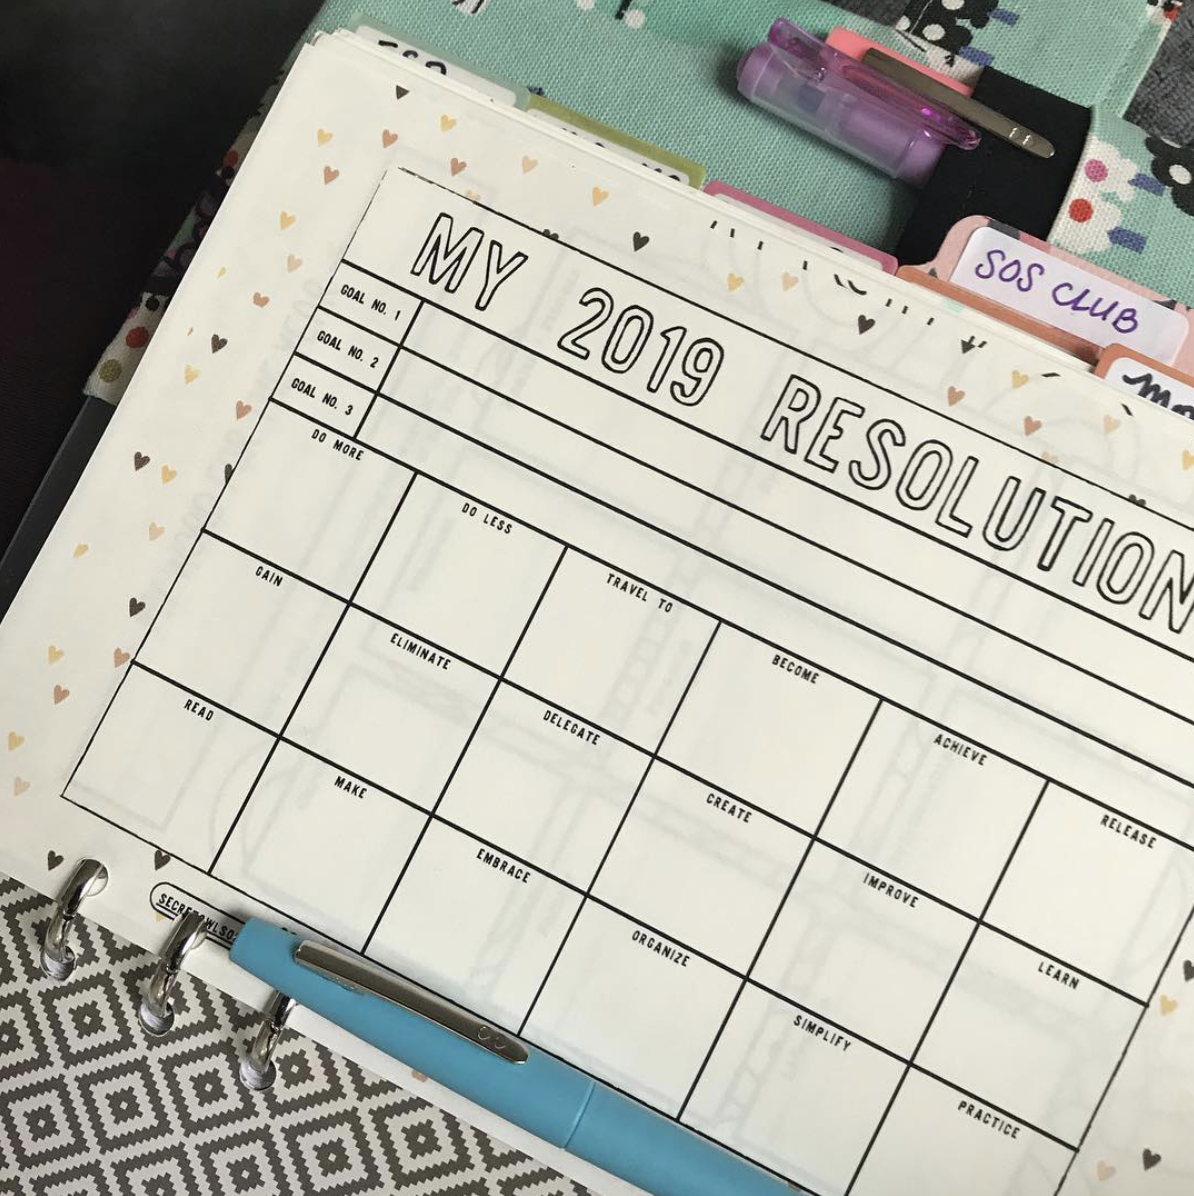 2019 Resolutions Printable